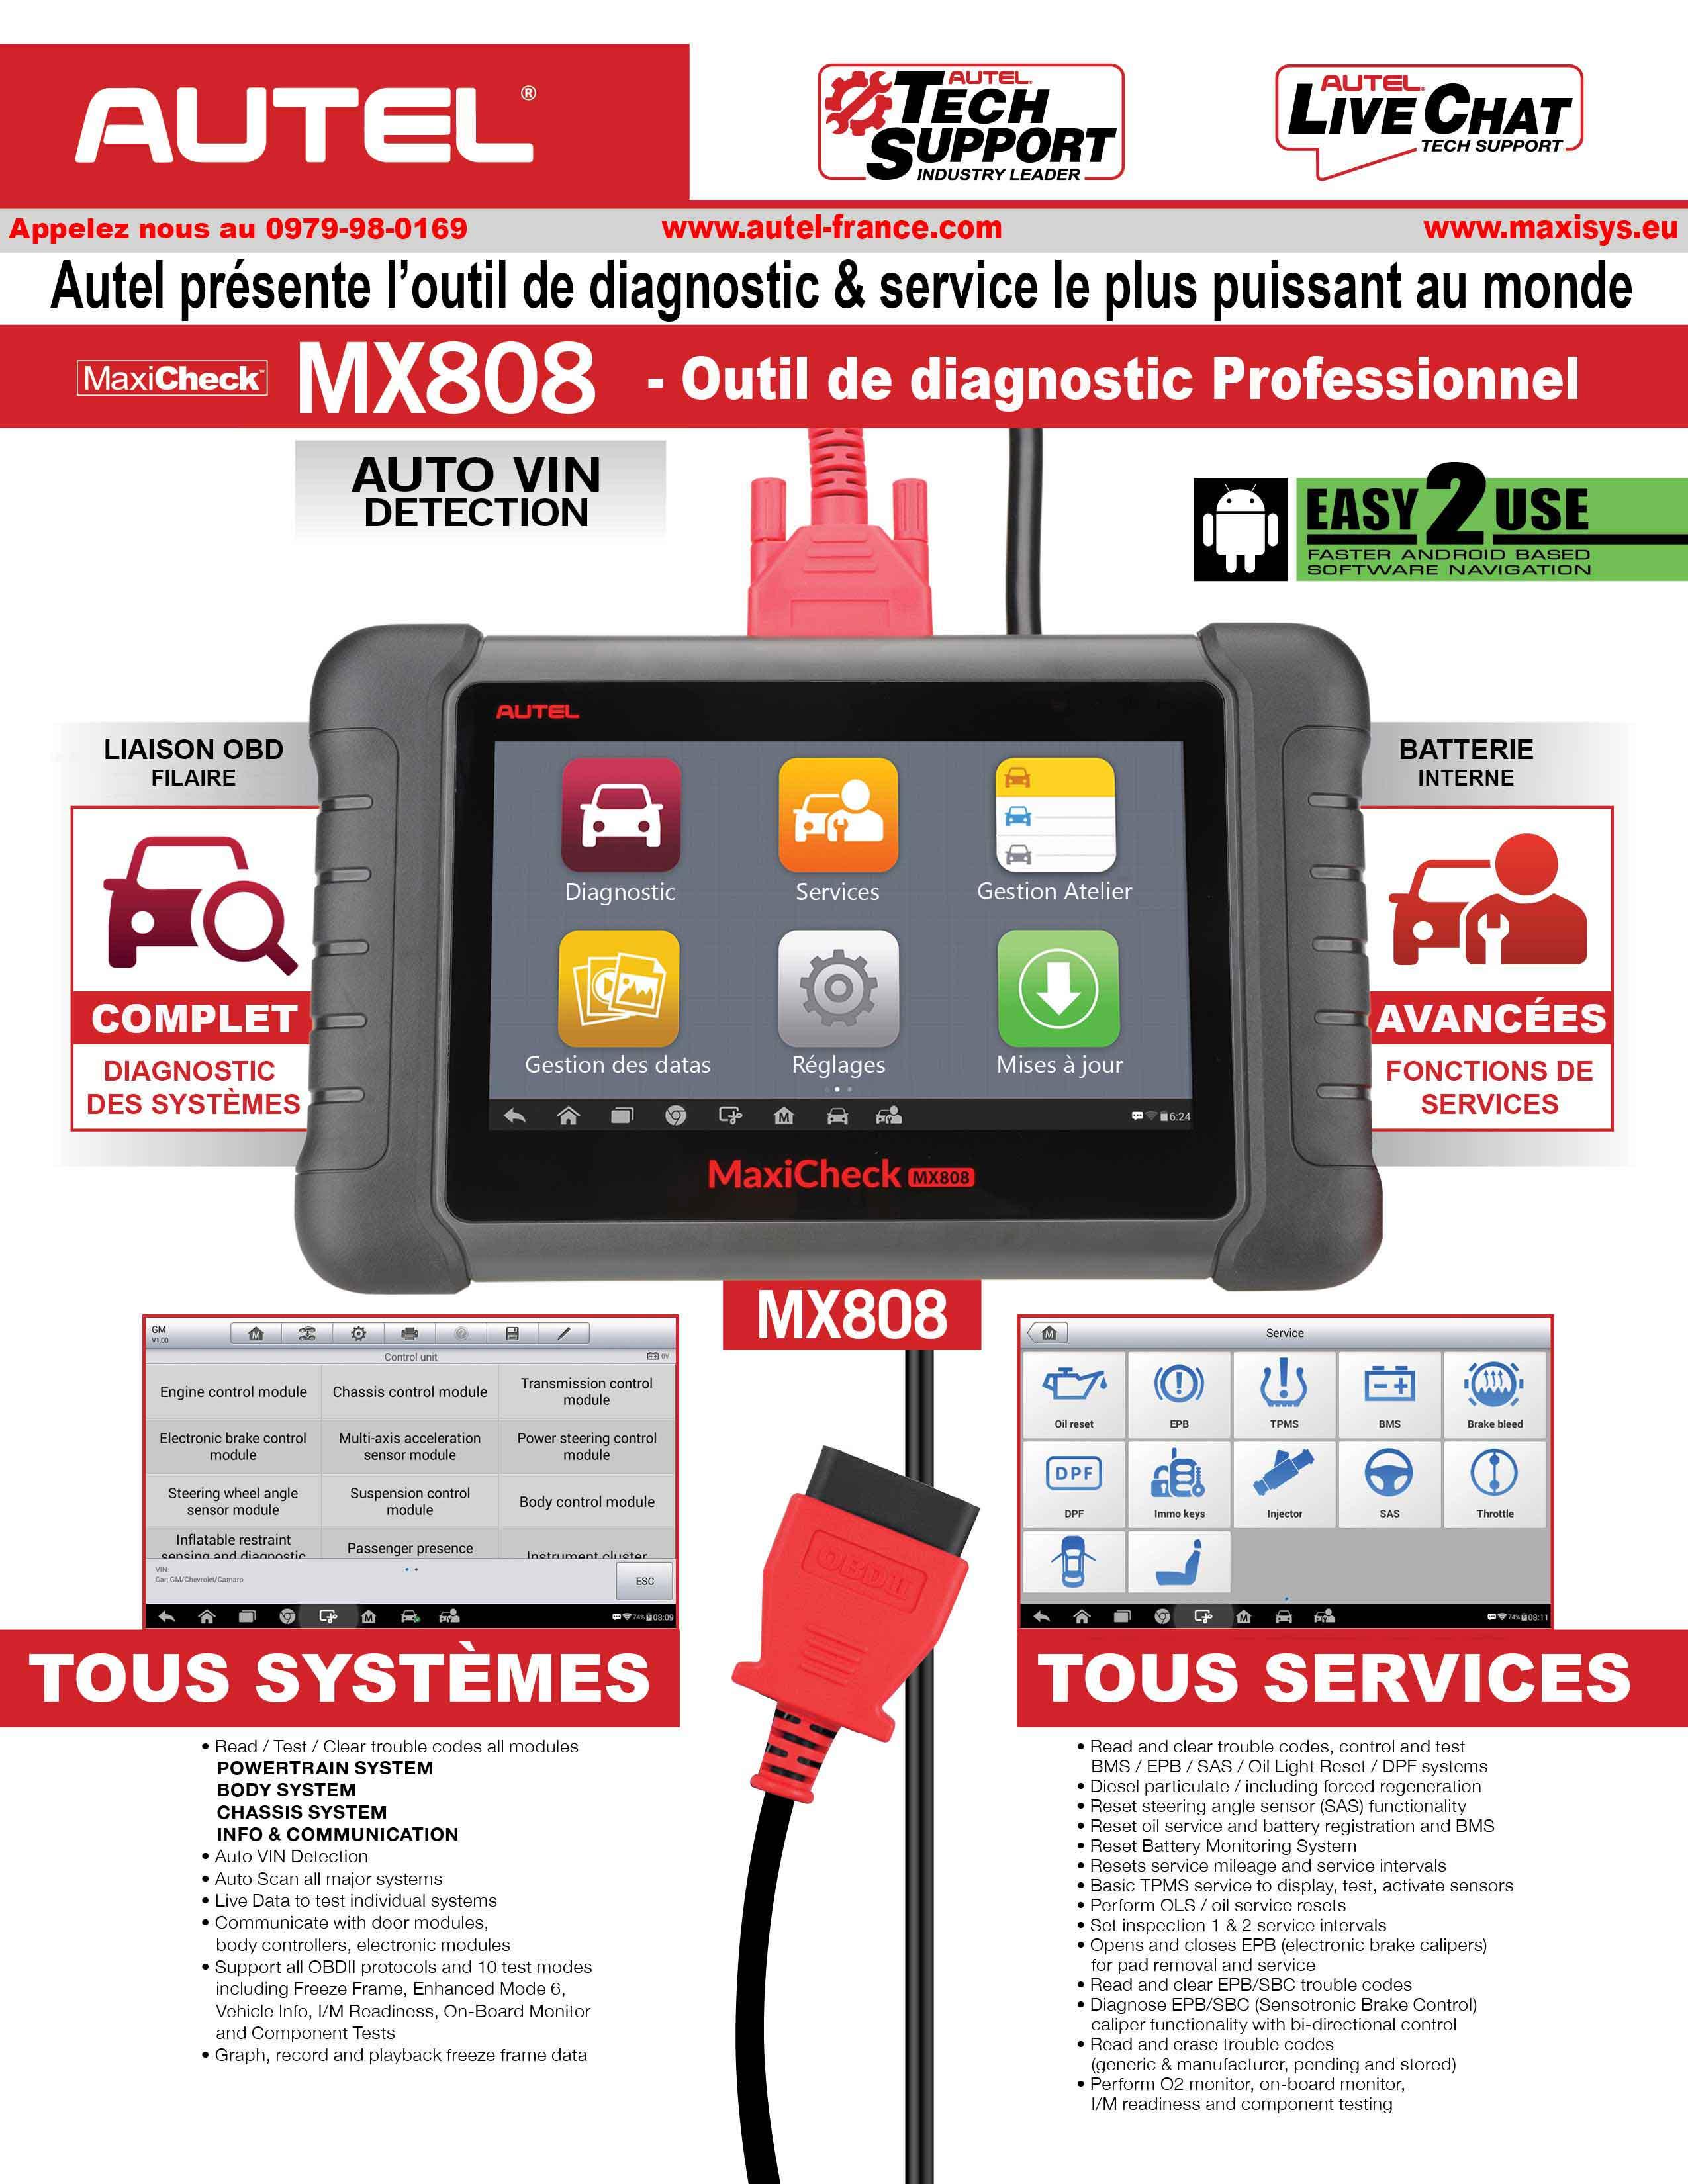 MaxiCheck MX808 AUTEL